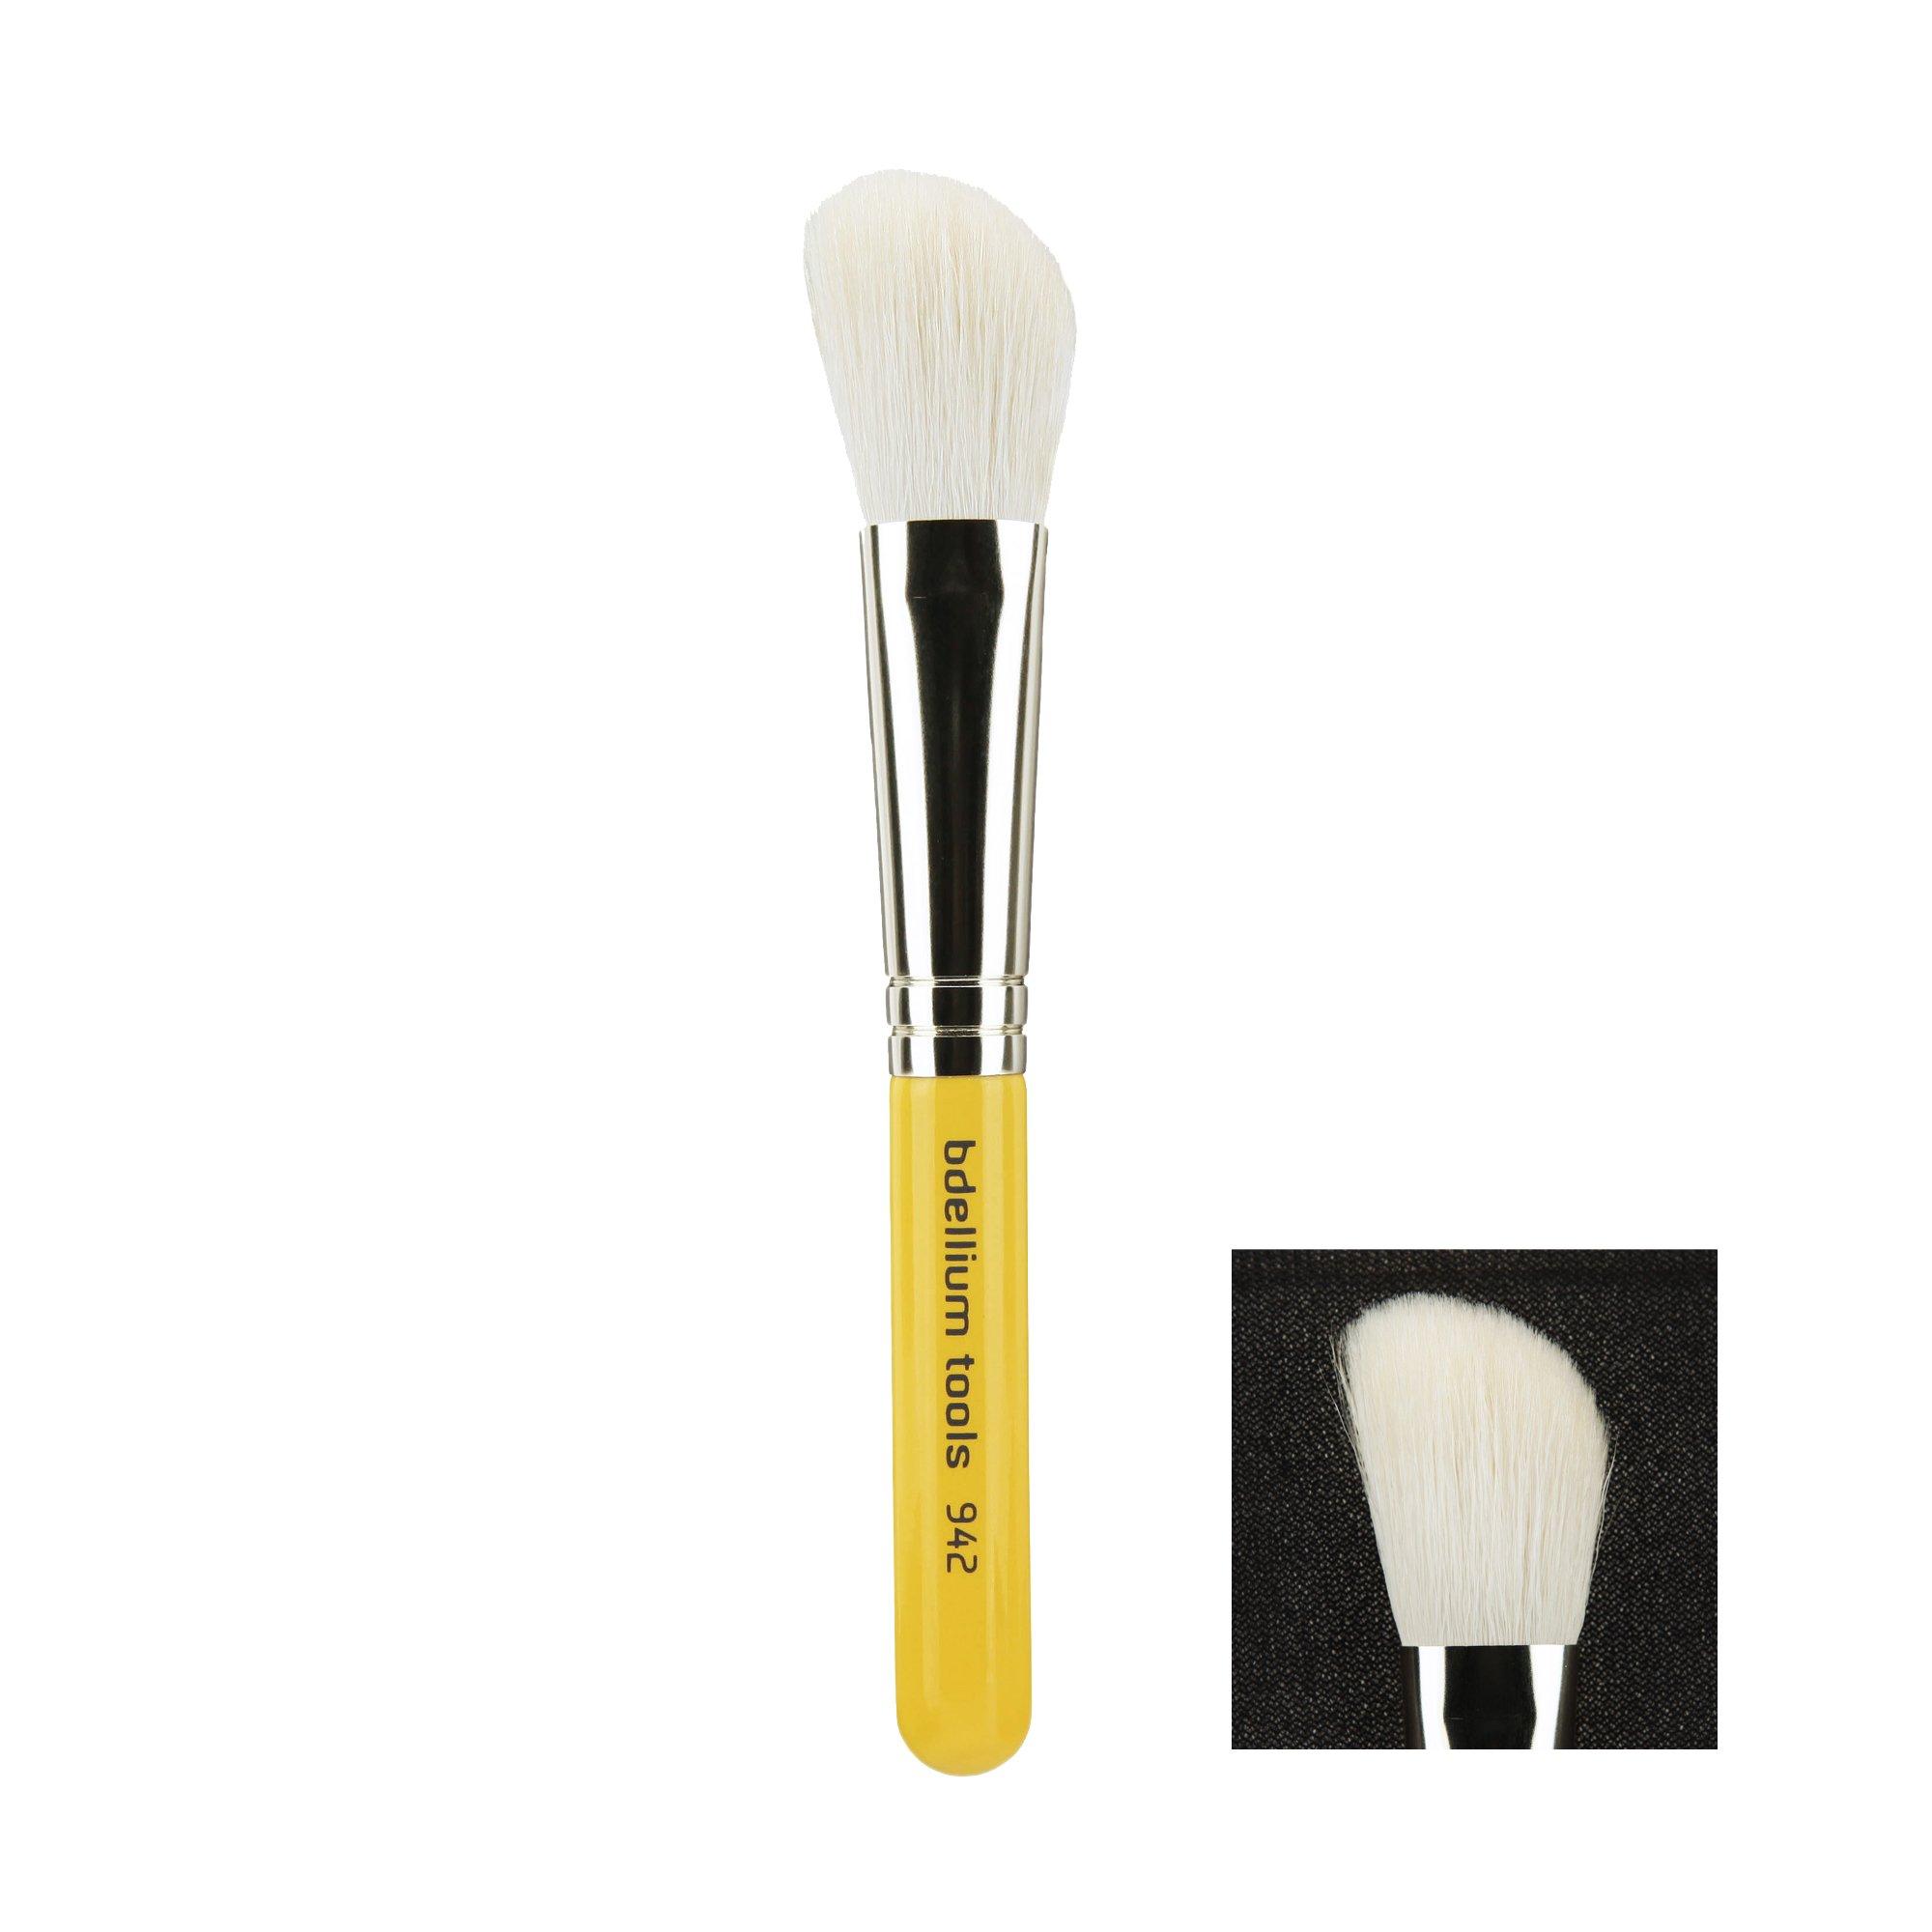 Bdellium Tools Travel Line Slanted Contour Brush, Yellow